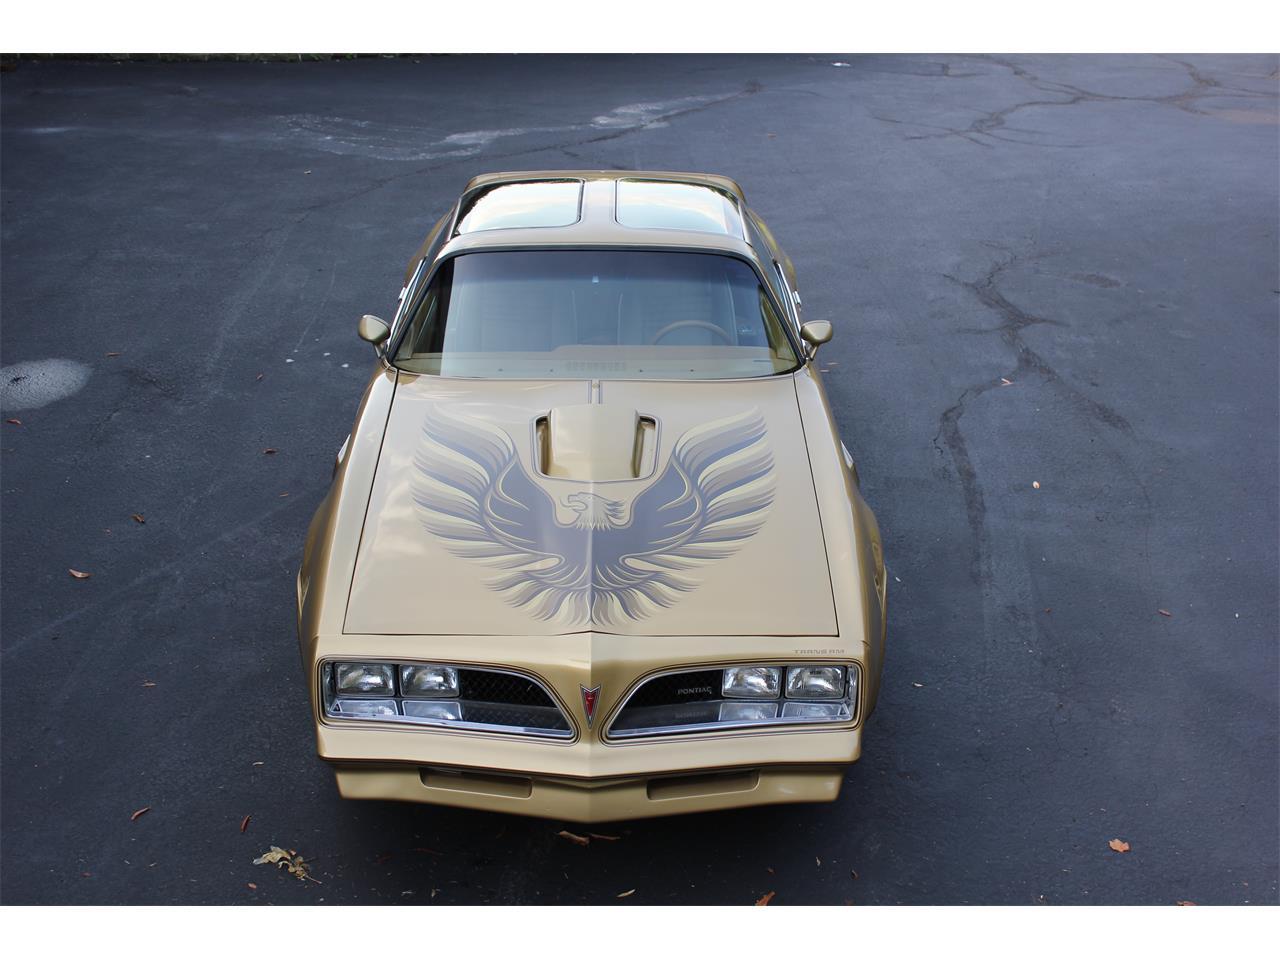 1978 Pontiac Firebird Trans Am (CC-1262026) for sale in Sharpsburg, Pennsylvania